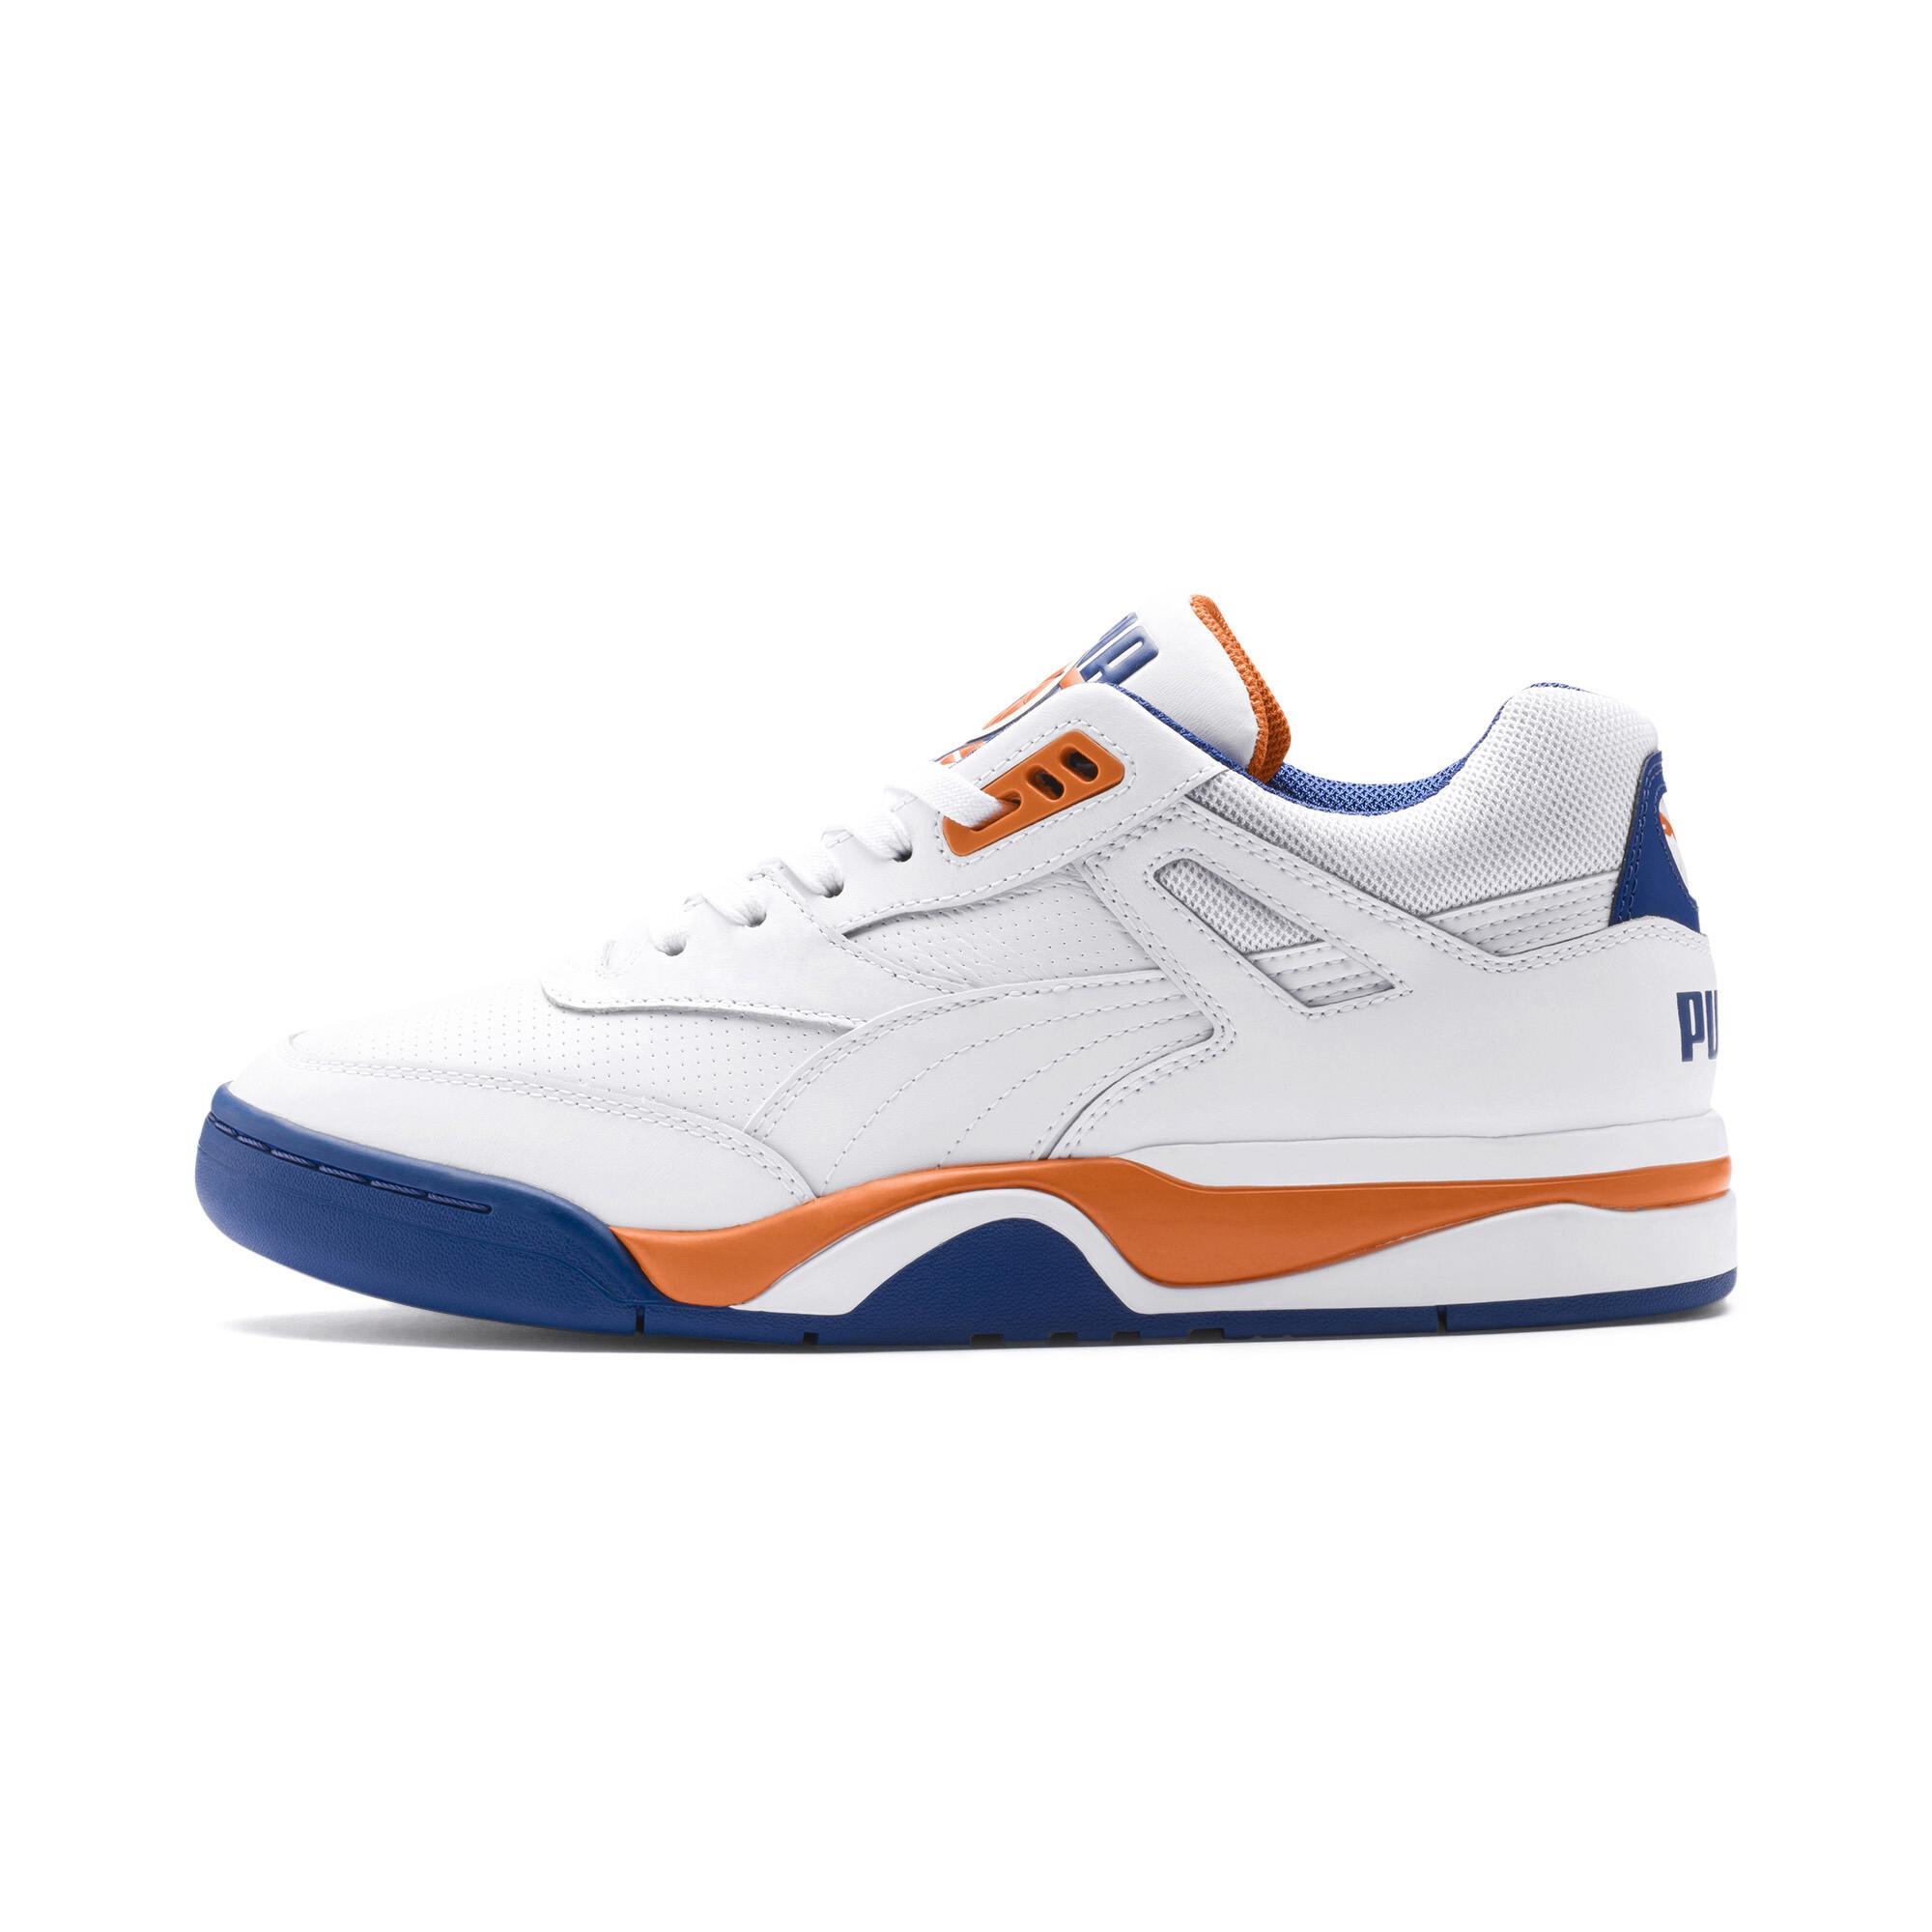 Indexbild 25 - PUMA Palace Guard Sneaker Unisex Schuhe Sport Classics Neu